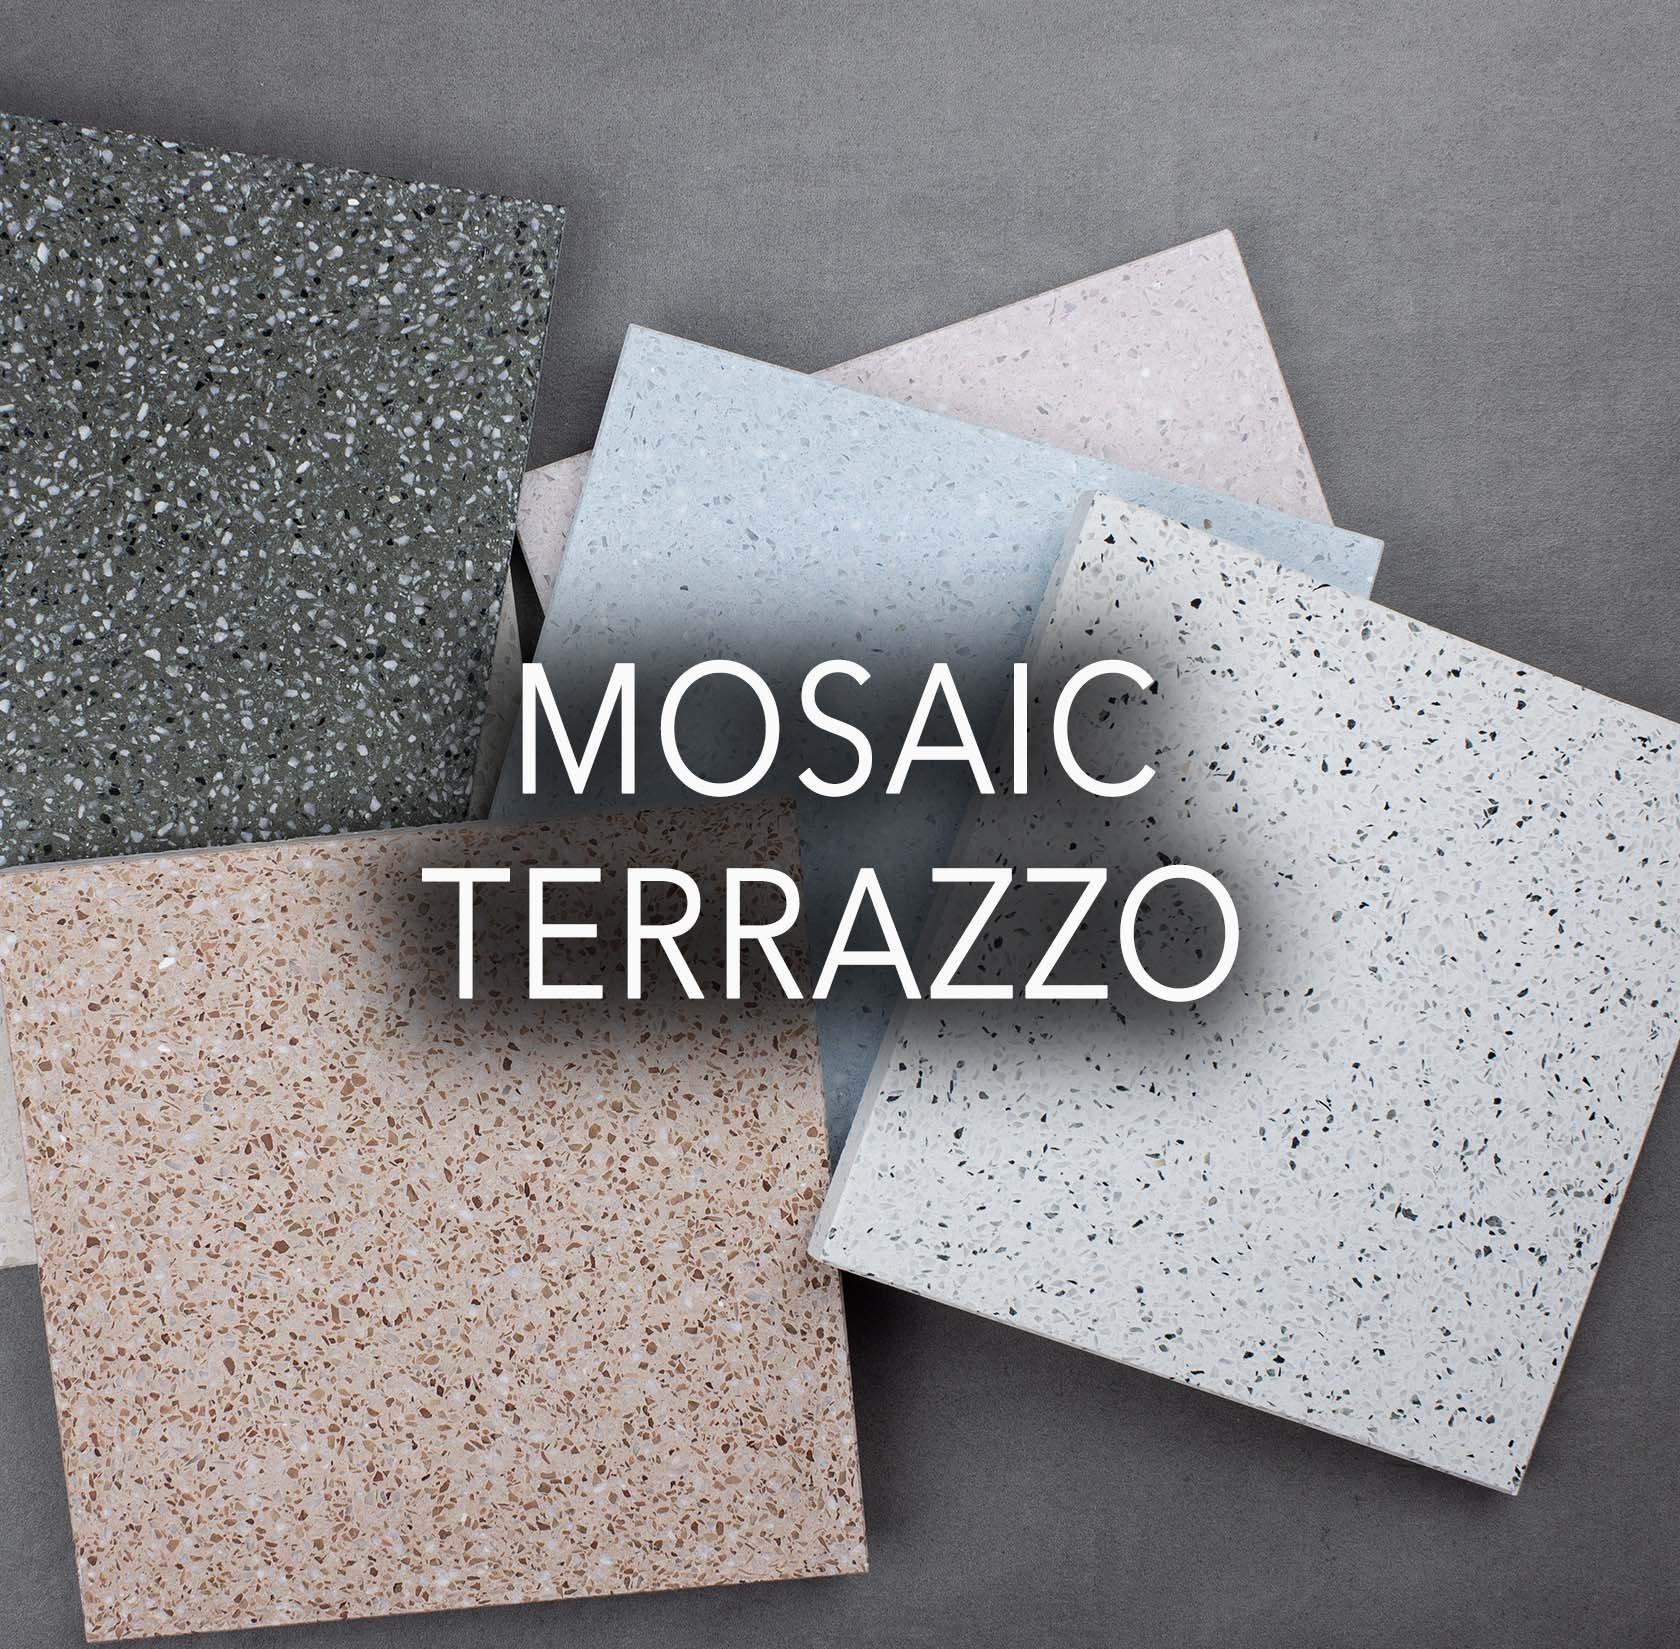 Mosaic Terrazzo Tiles